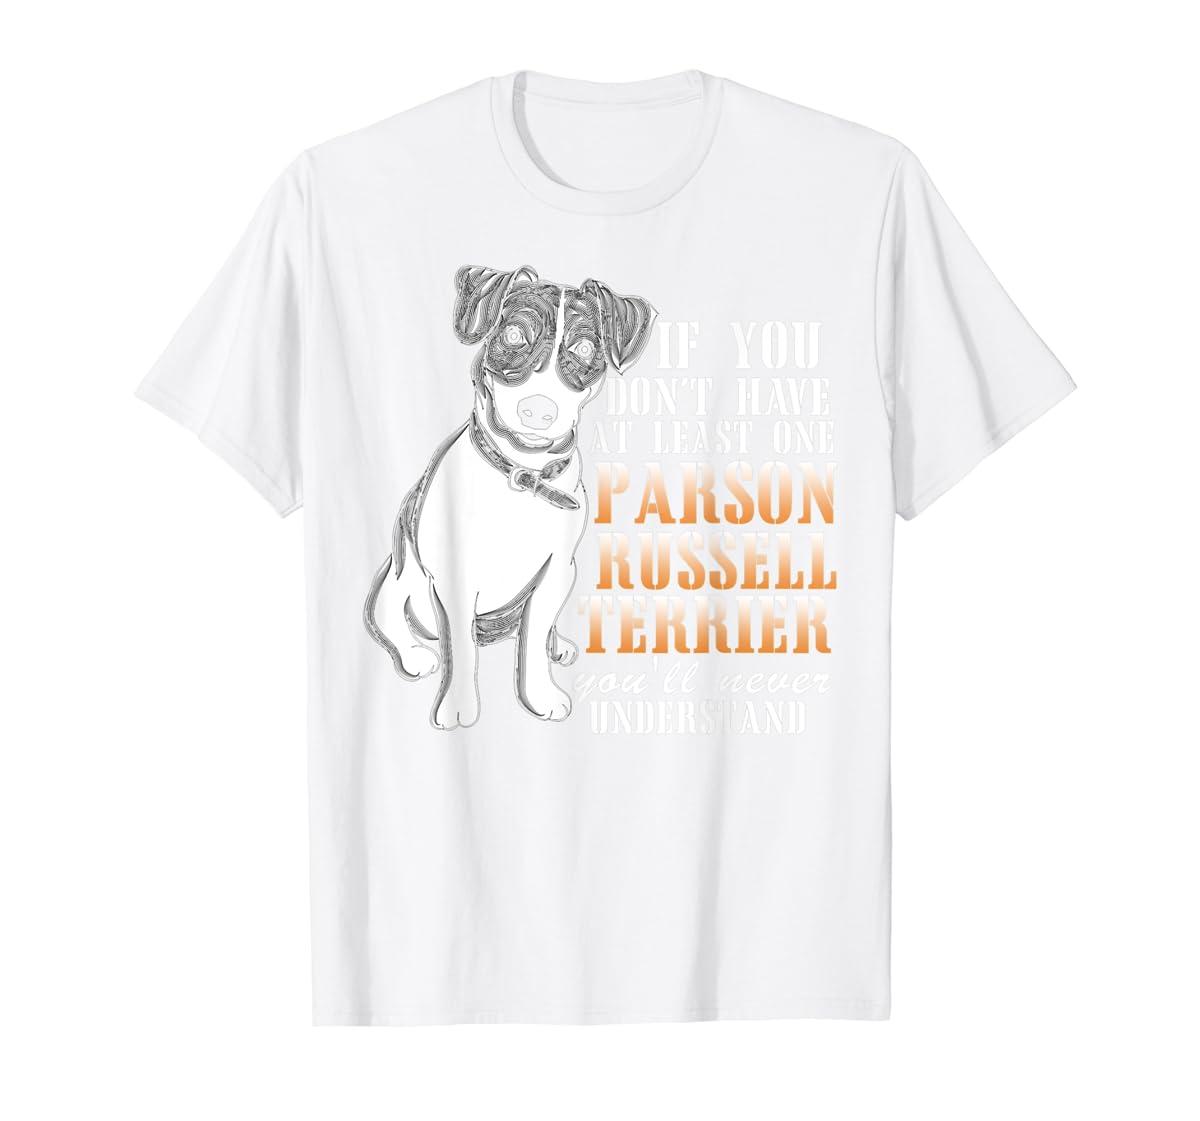 Parson Russell Terrier T Shirt, I Love My Dog T Shirt-Men's T-Shirt-White